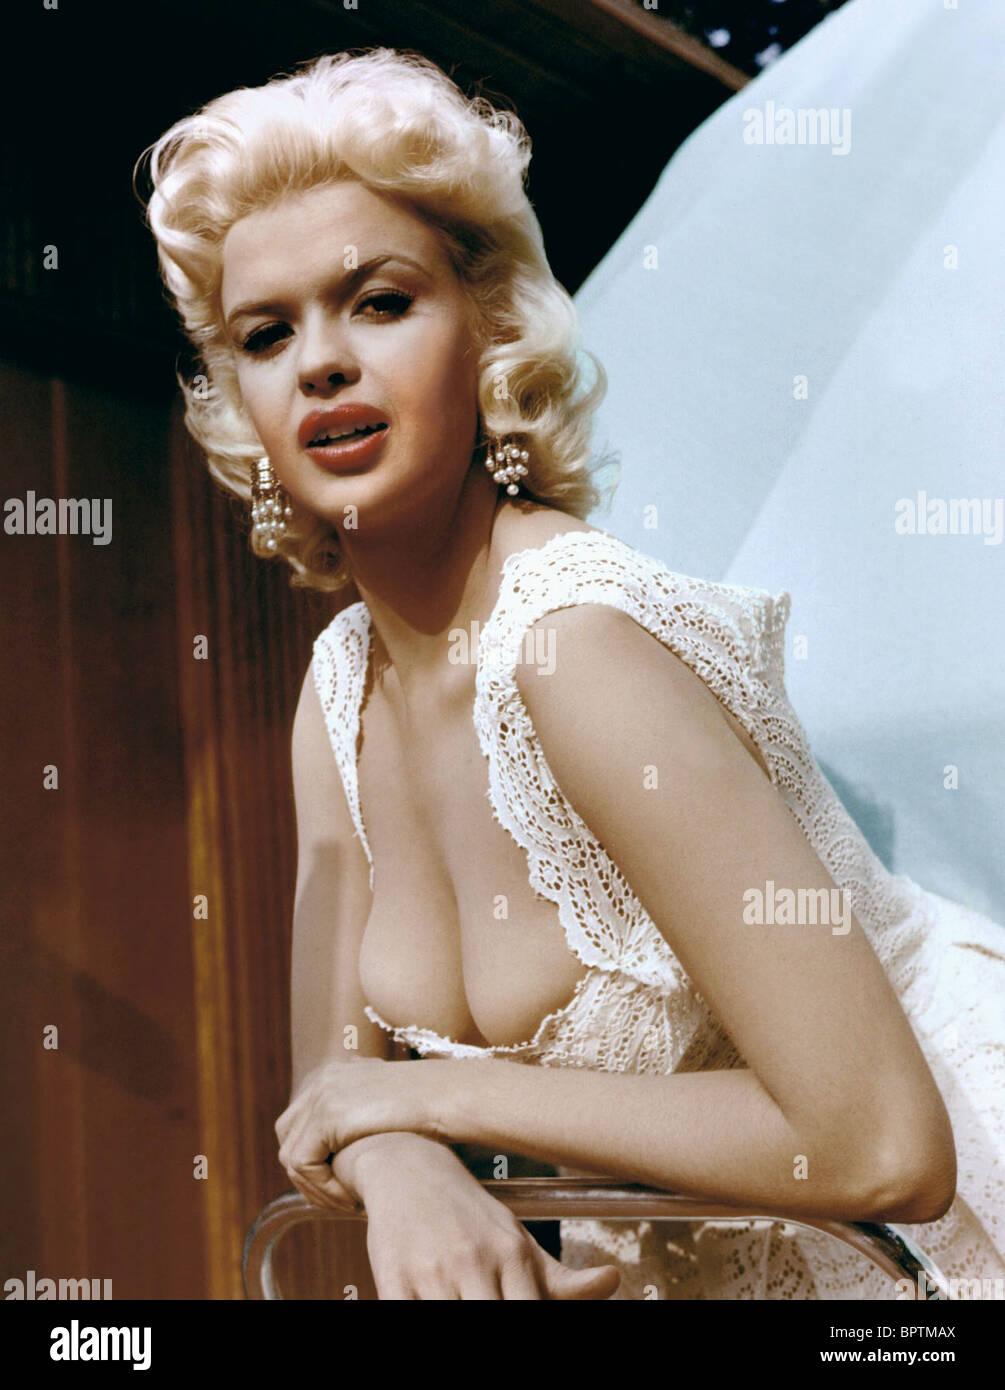 Jane Mansfield Jayne Mansfield Actress 1960 Stock Photo